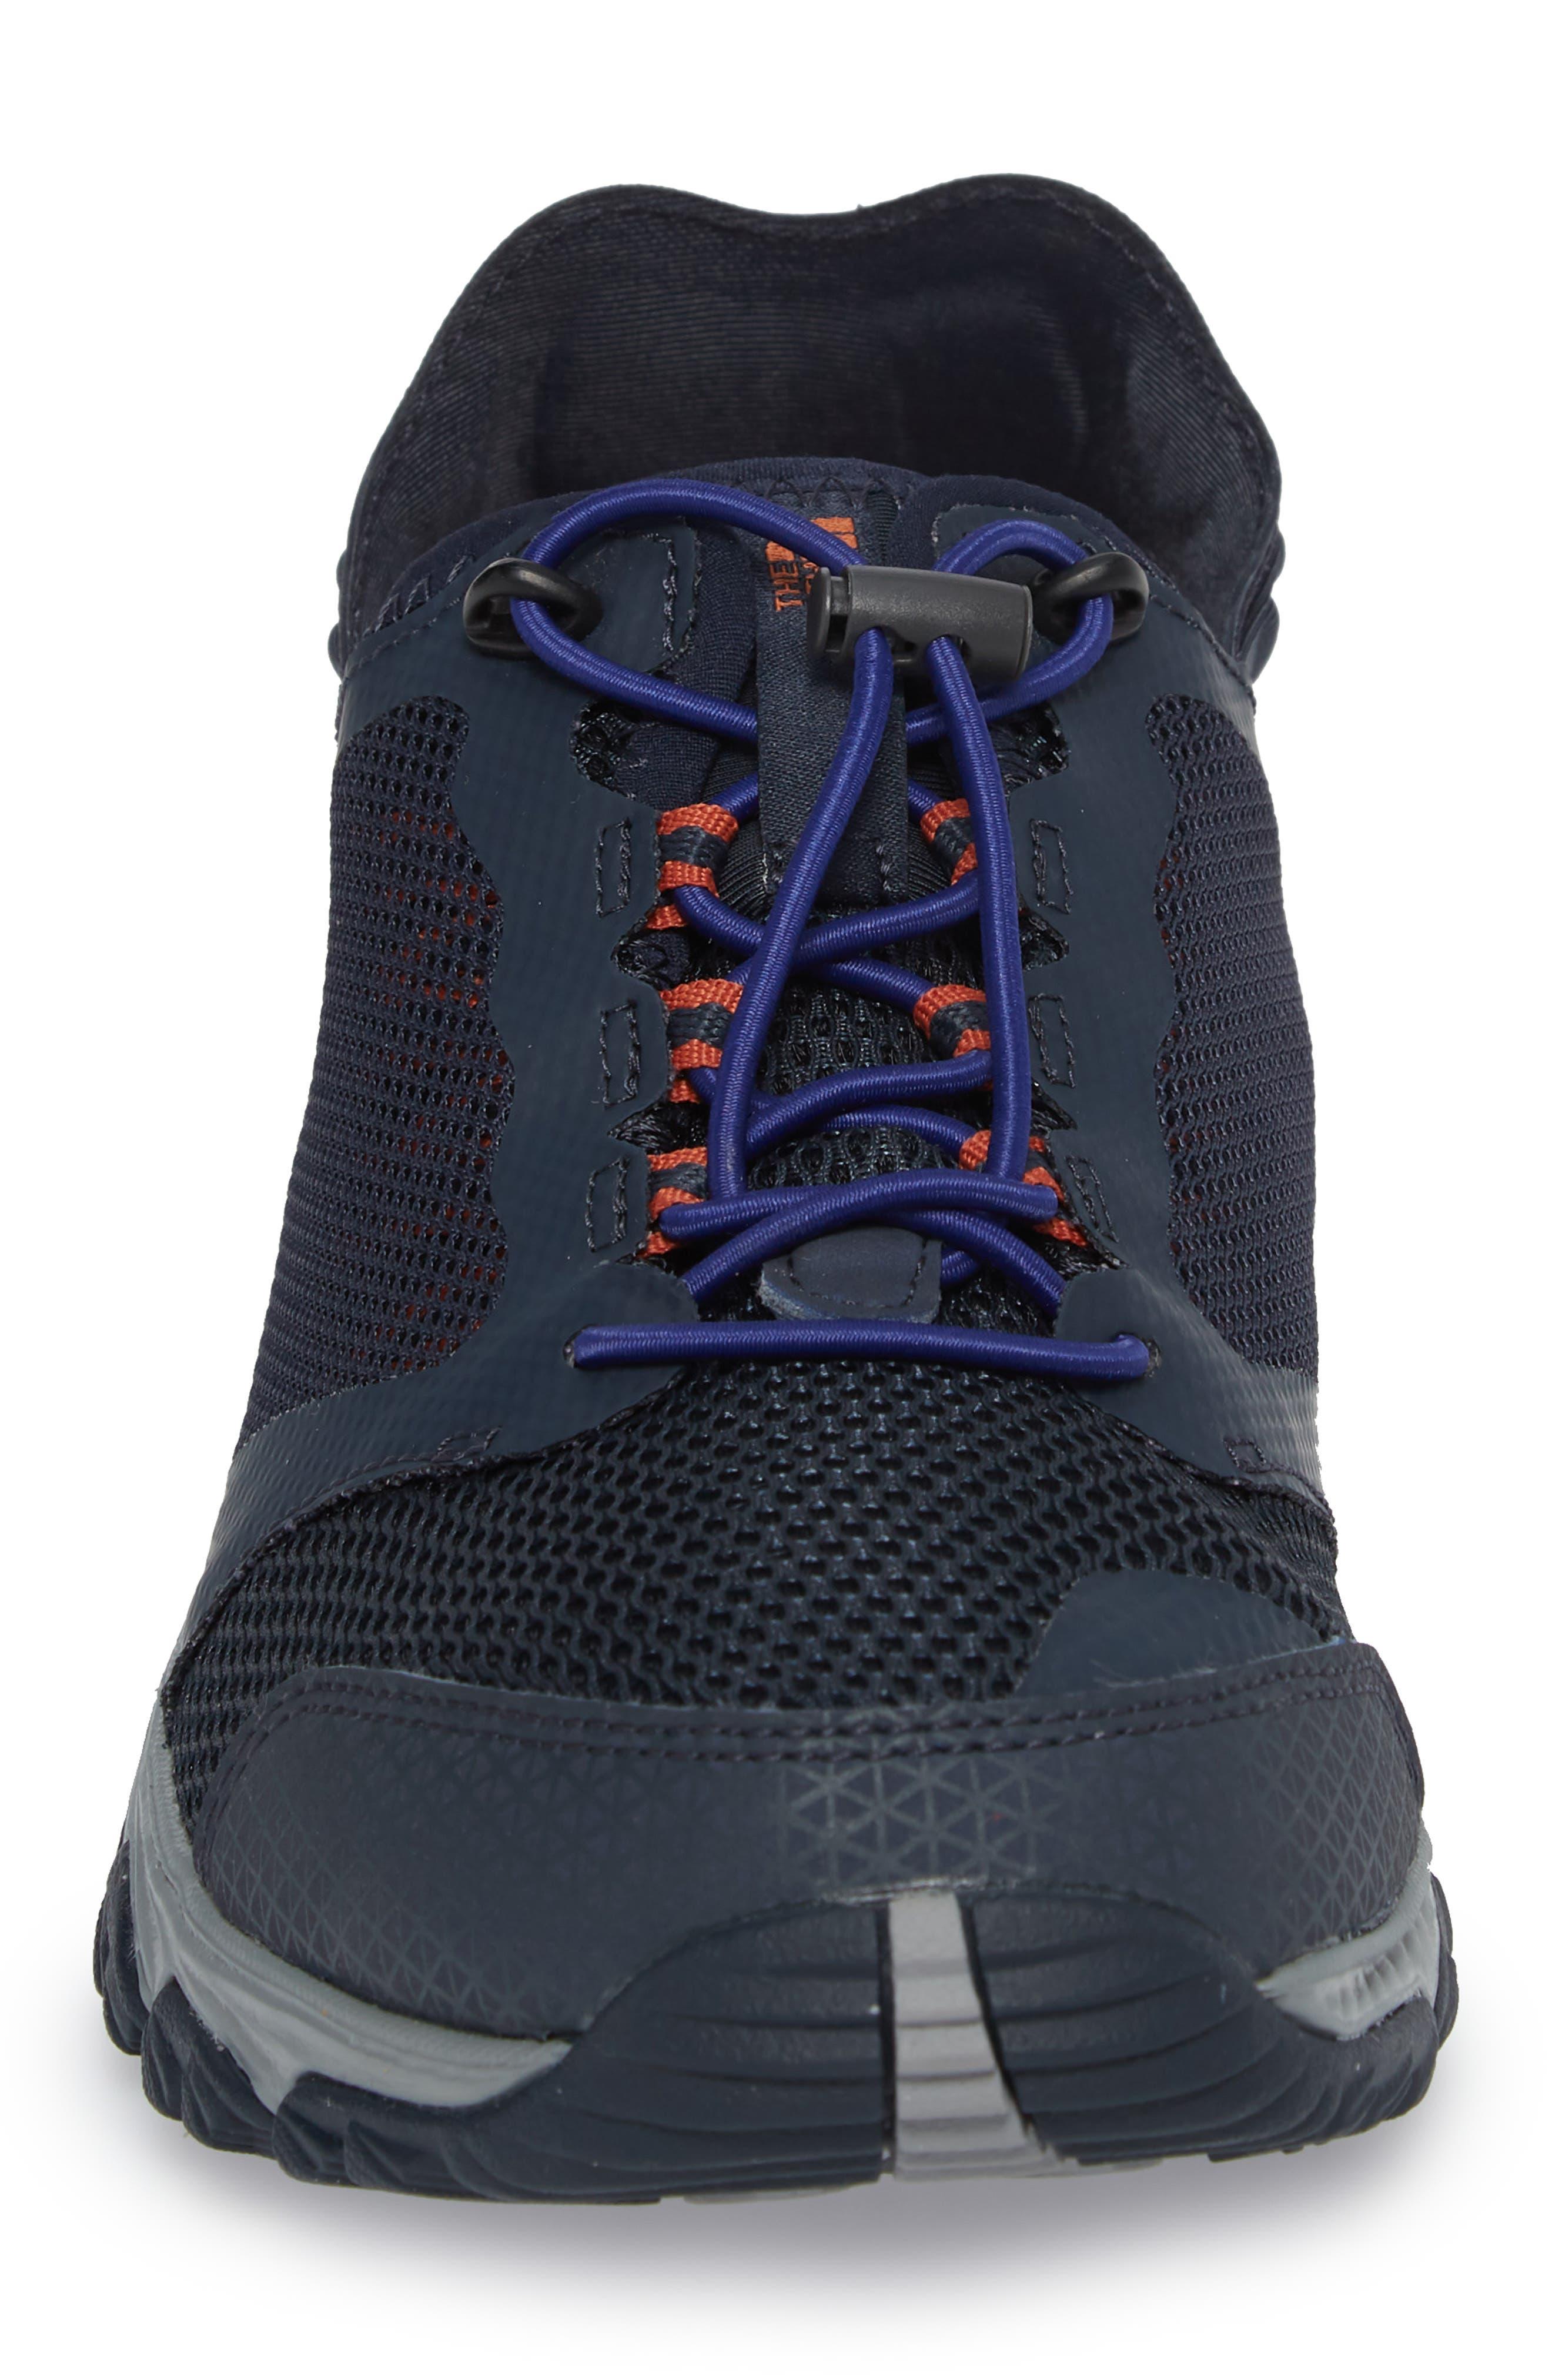 Litewave Amphibious II Collapsible Sneaker,                             Alternate thumbnail 4, color,                             Urban Navy/ Brit Blue